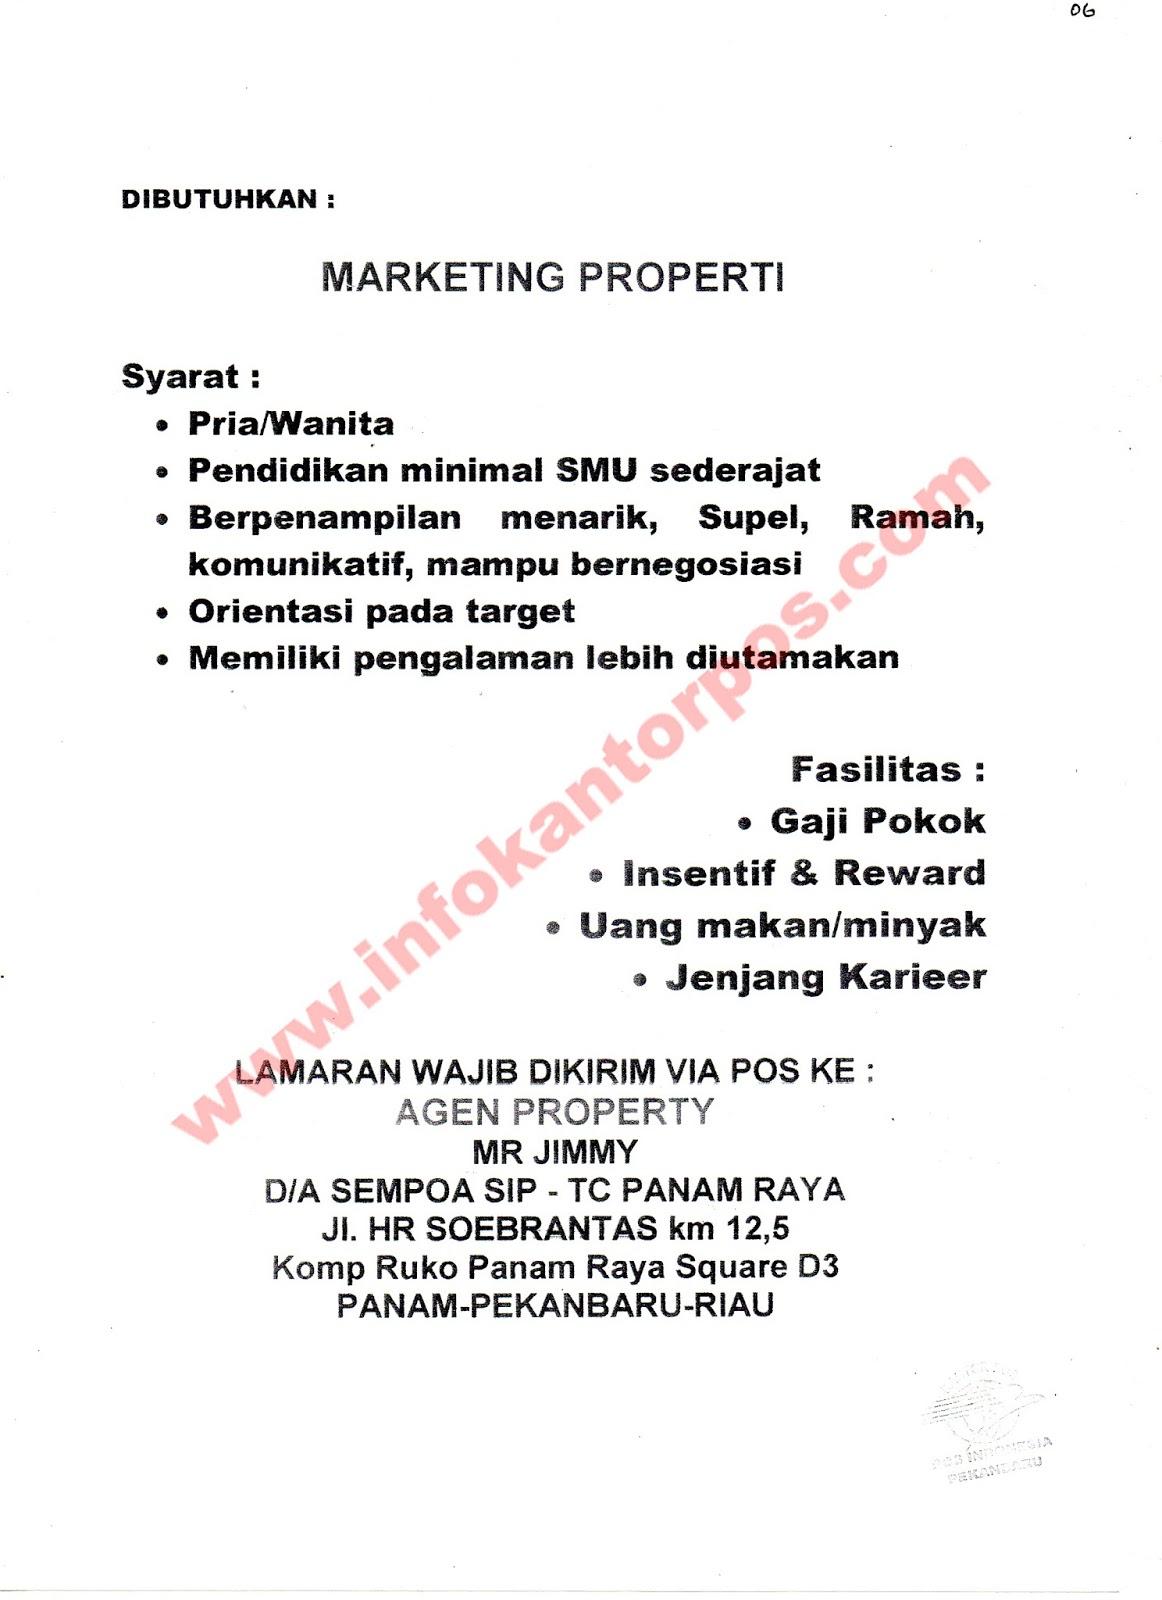 Lowongan Kerja Marketing Properti Juli 2017 Www Infokantorpos Com